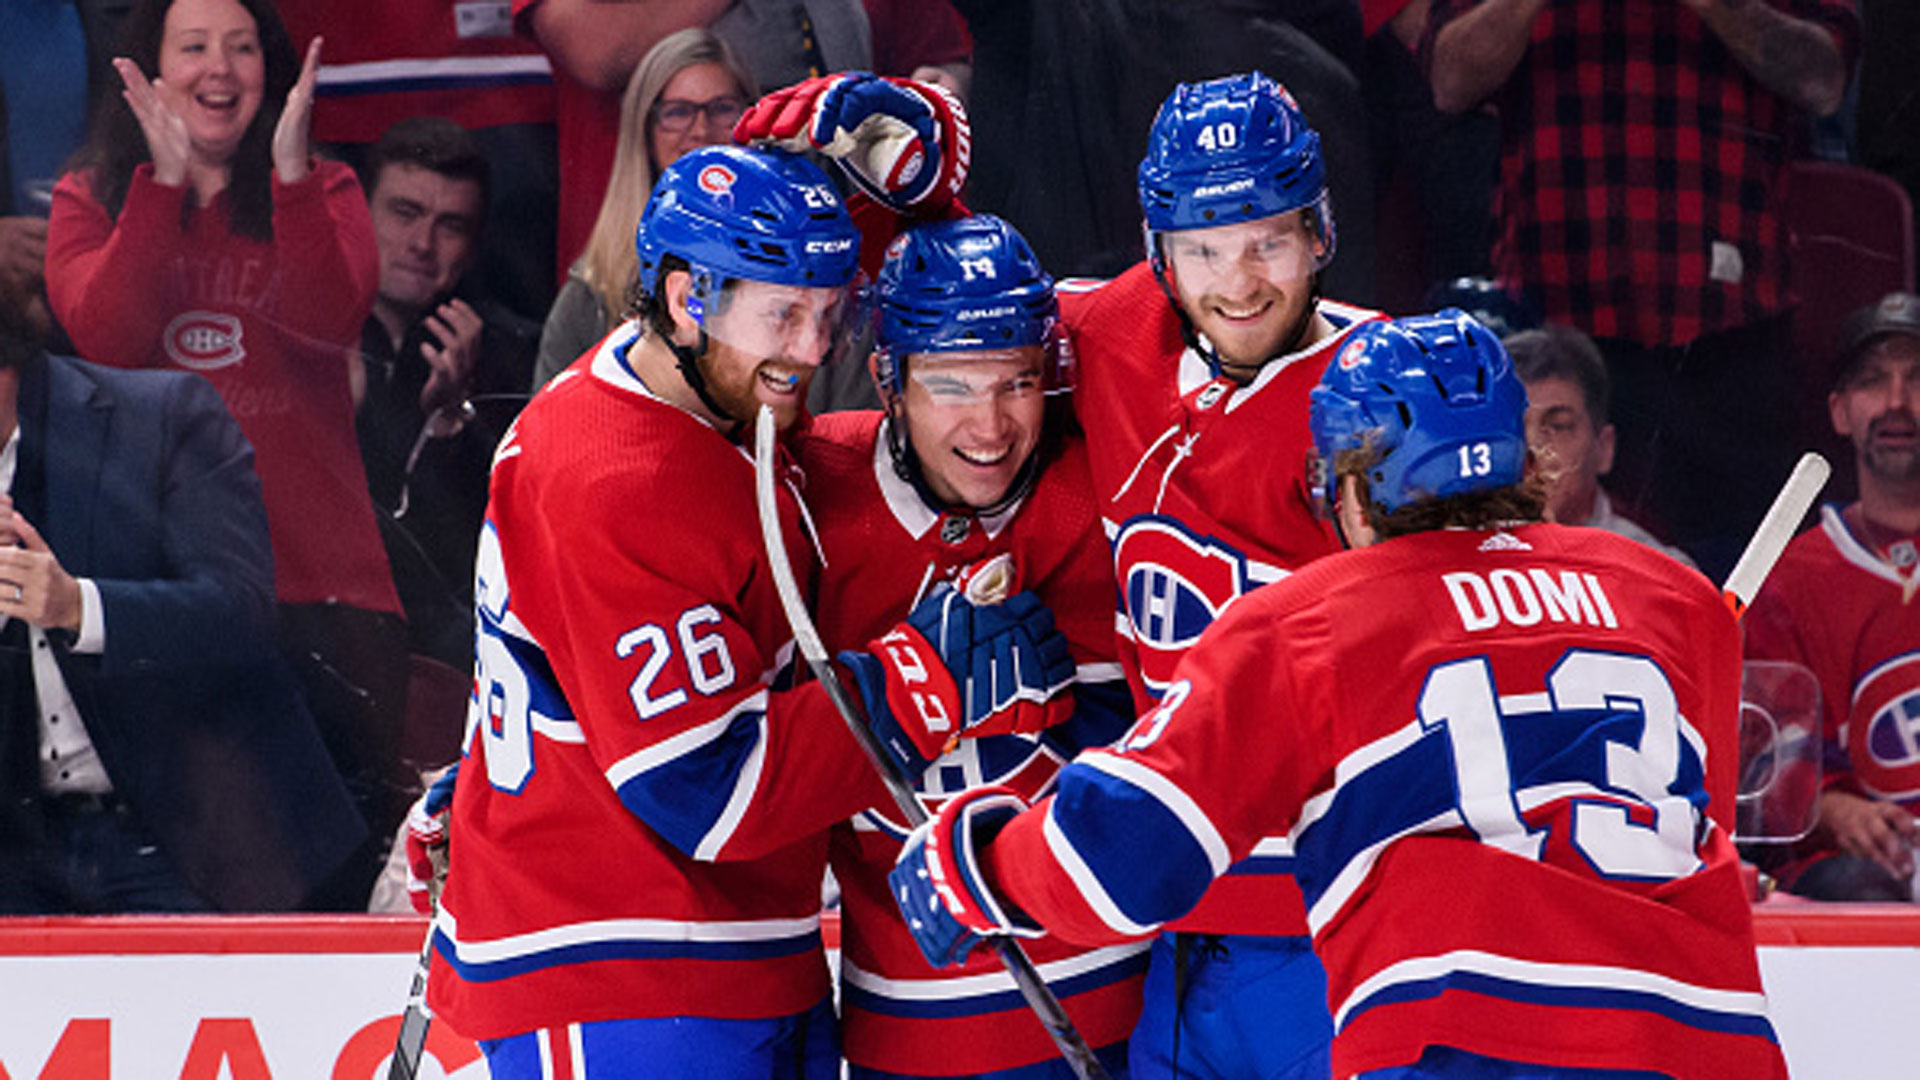 NHL: Wild 0, Canadiens 4